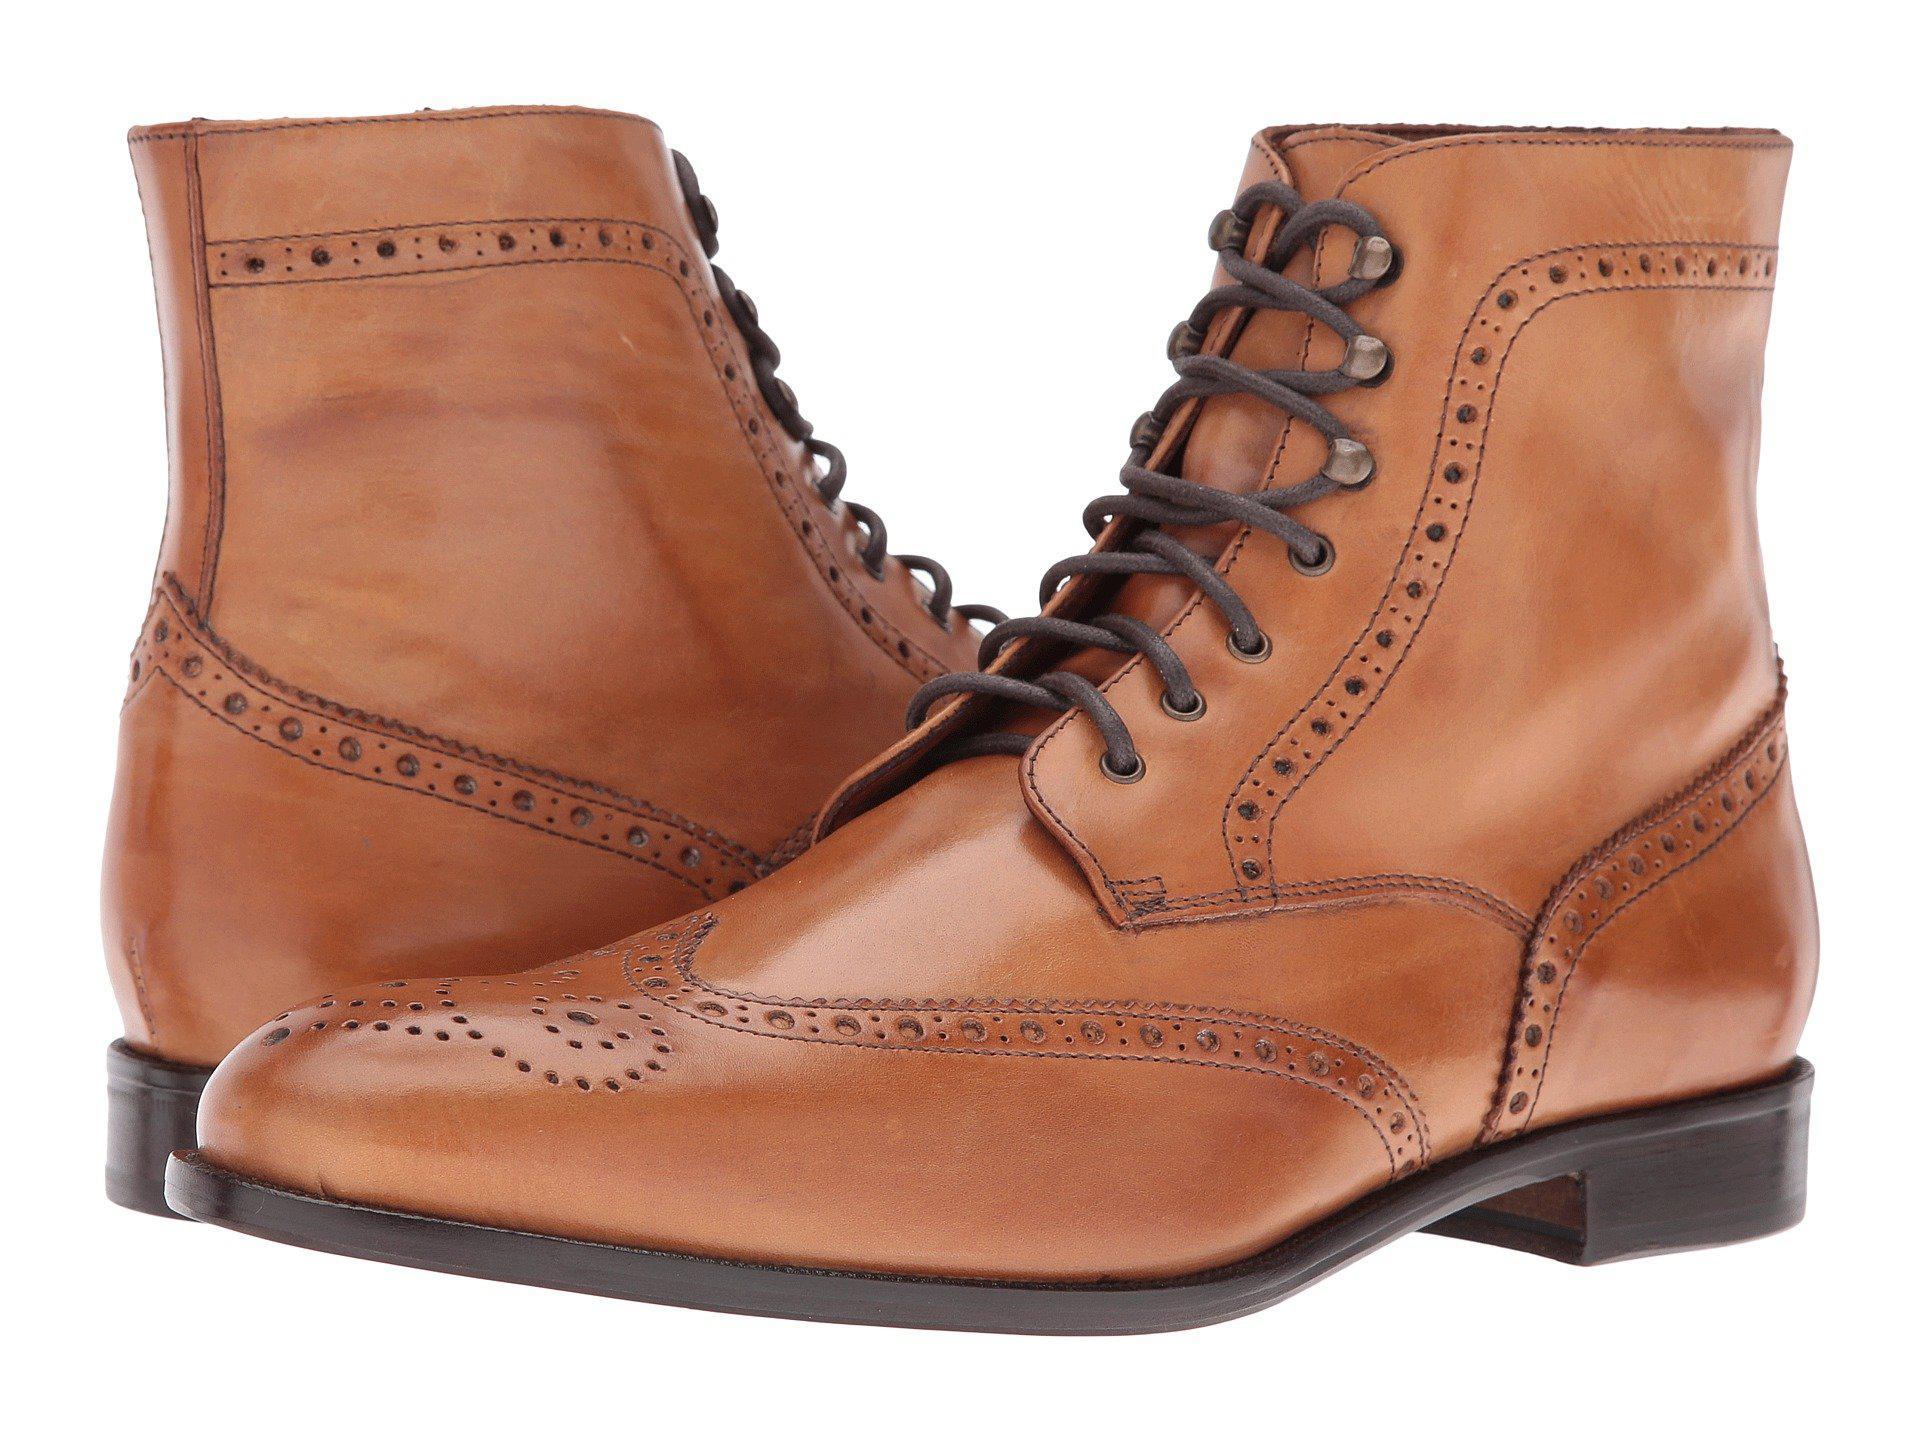 Massimo Matteo7-Eye Wing Boot gd97Y2kOl